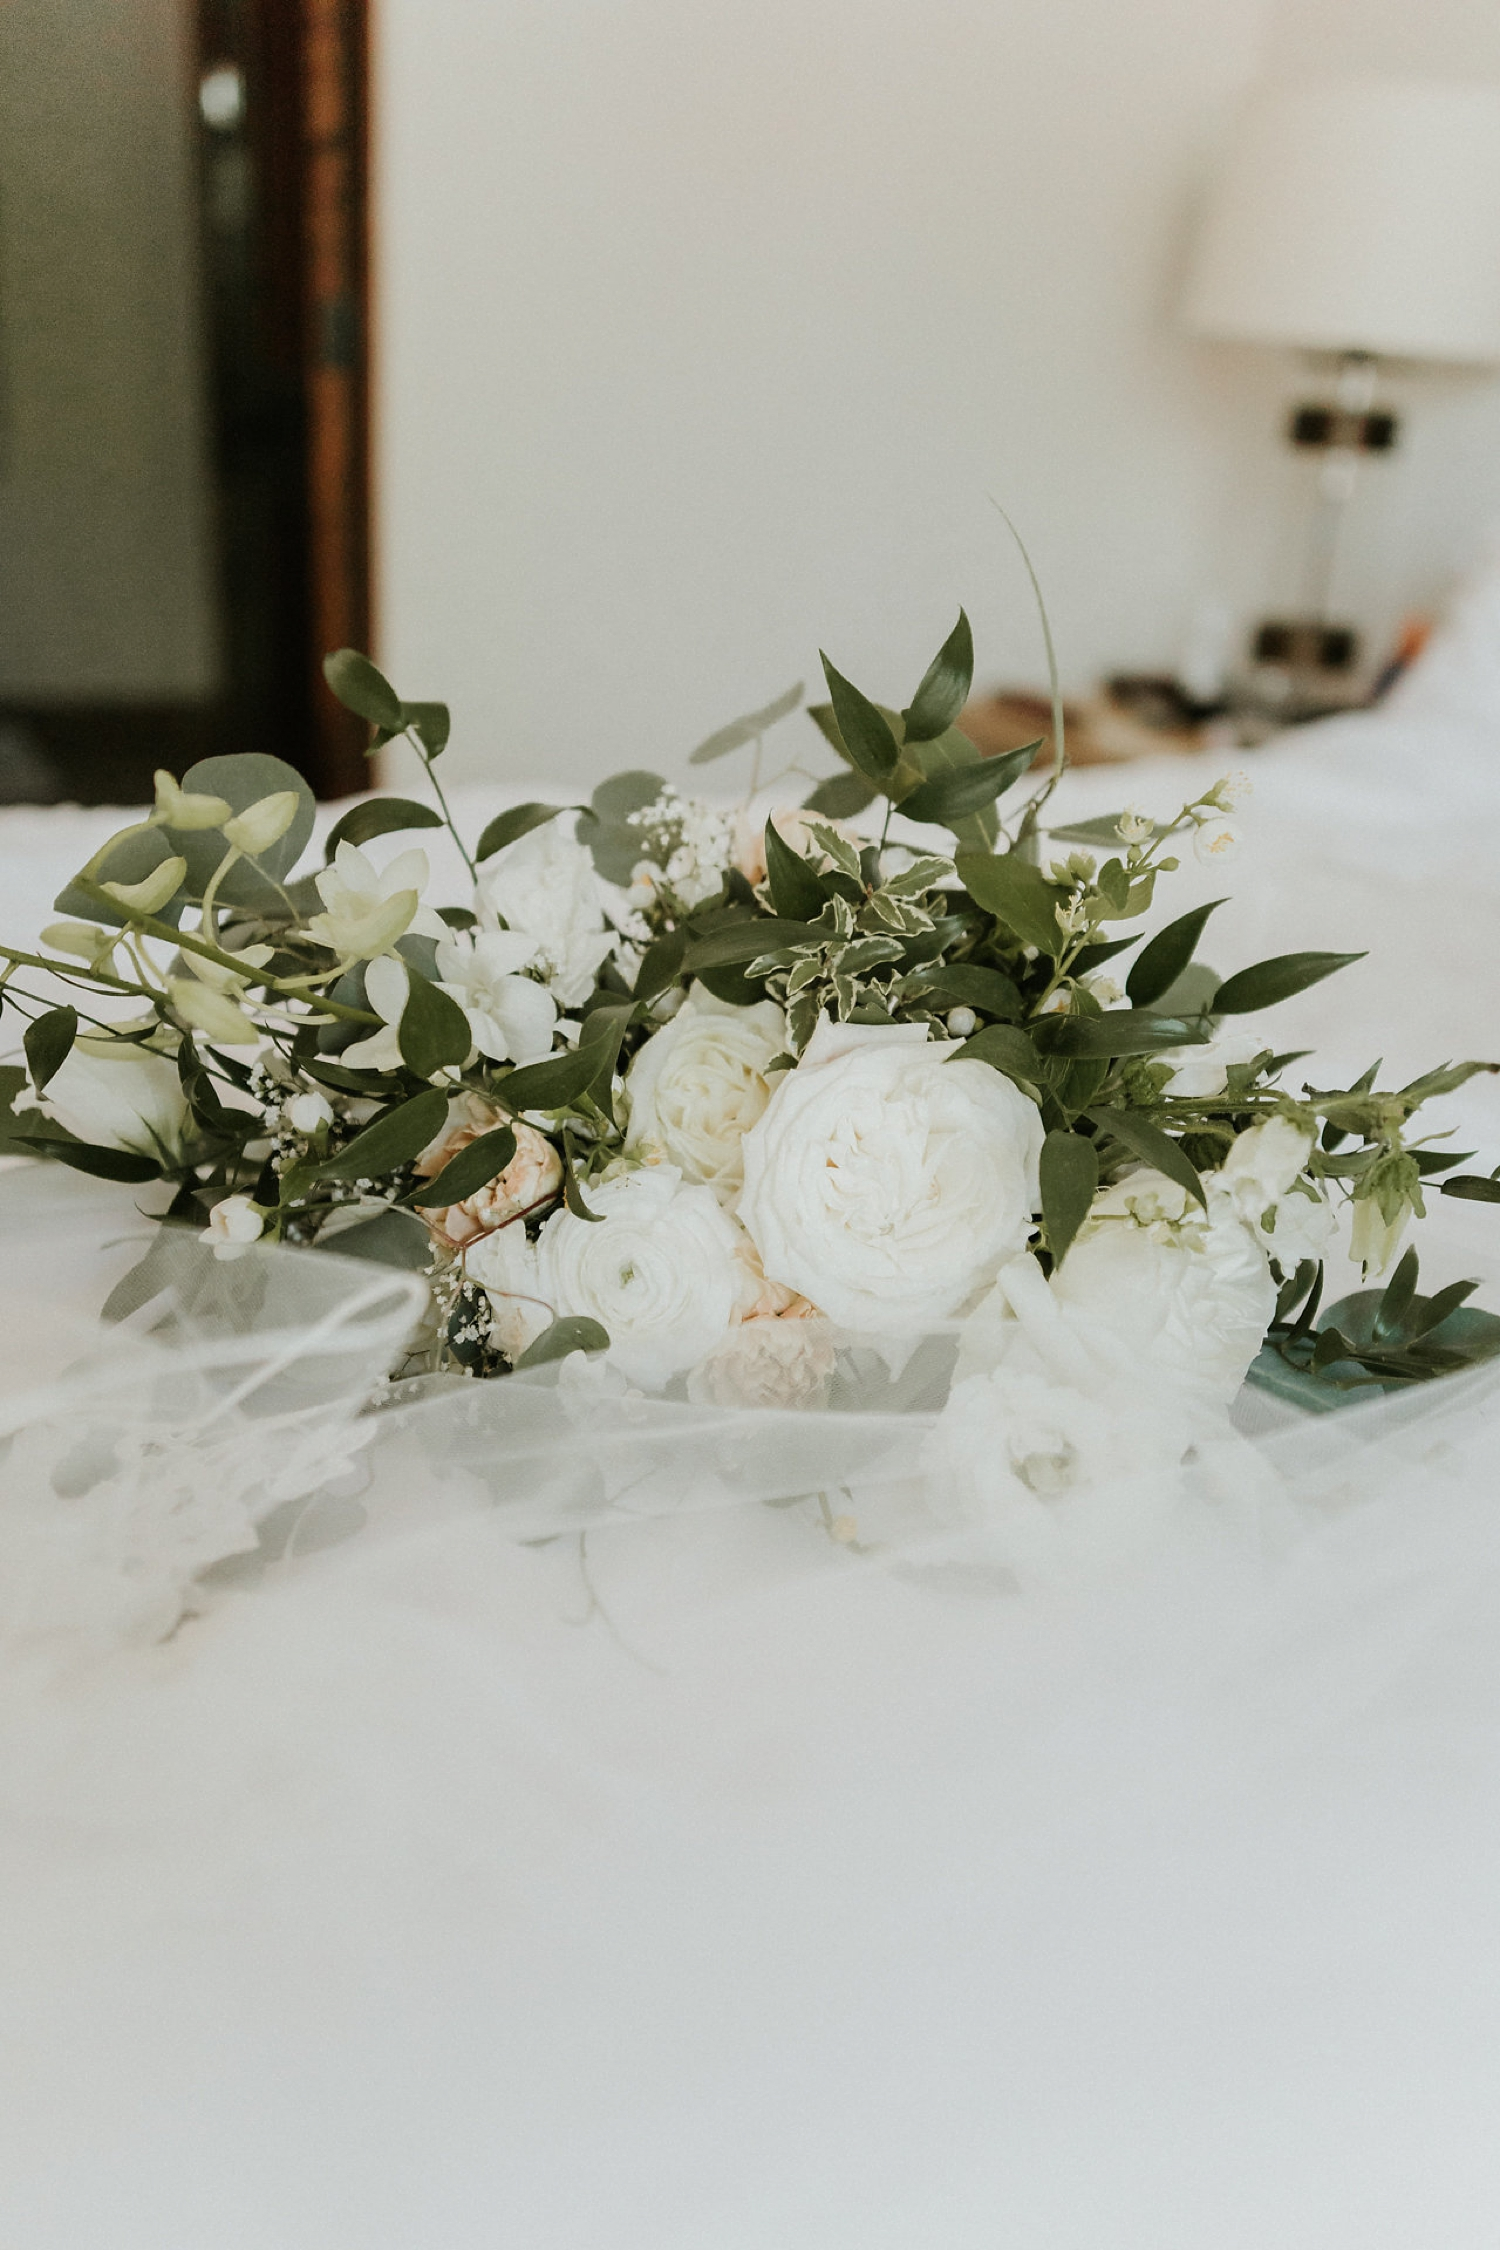 Alicia+lucia+photography+-+albuquerque+wedding+photographer+-+santa+fe+wedding+photography+-+new+mexico+wedding+photographer+-+wedding+flowers+-+summer+wedding+flowers_0040.jpg